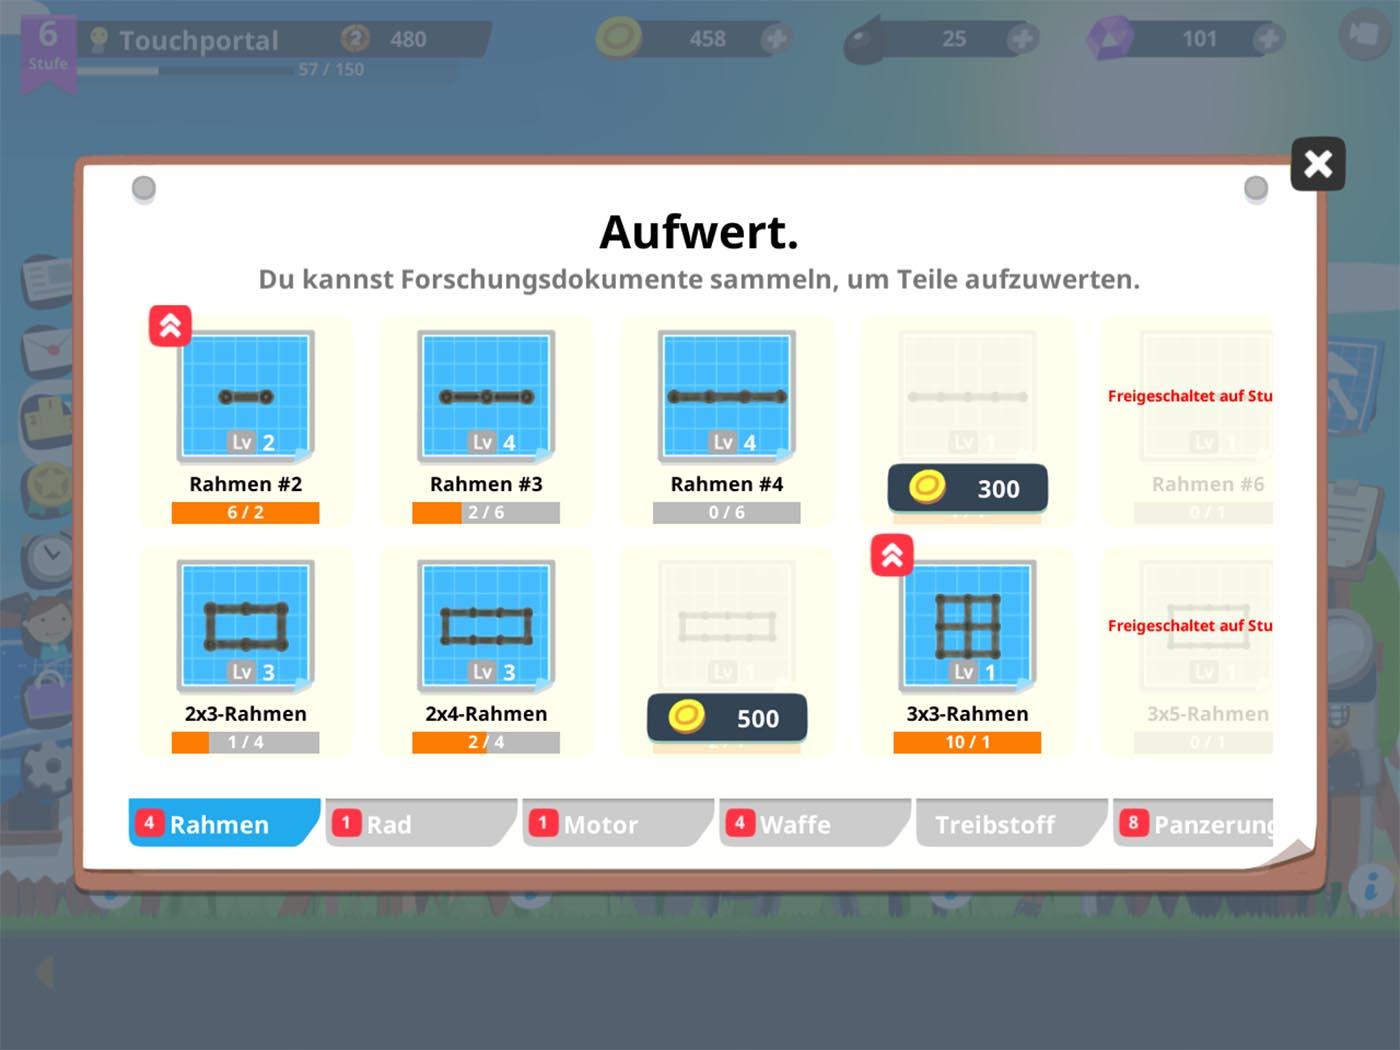 Schön 2x3 Rahmen Bilder - Bilderrahmen Ideen - szurop.info